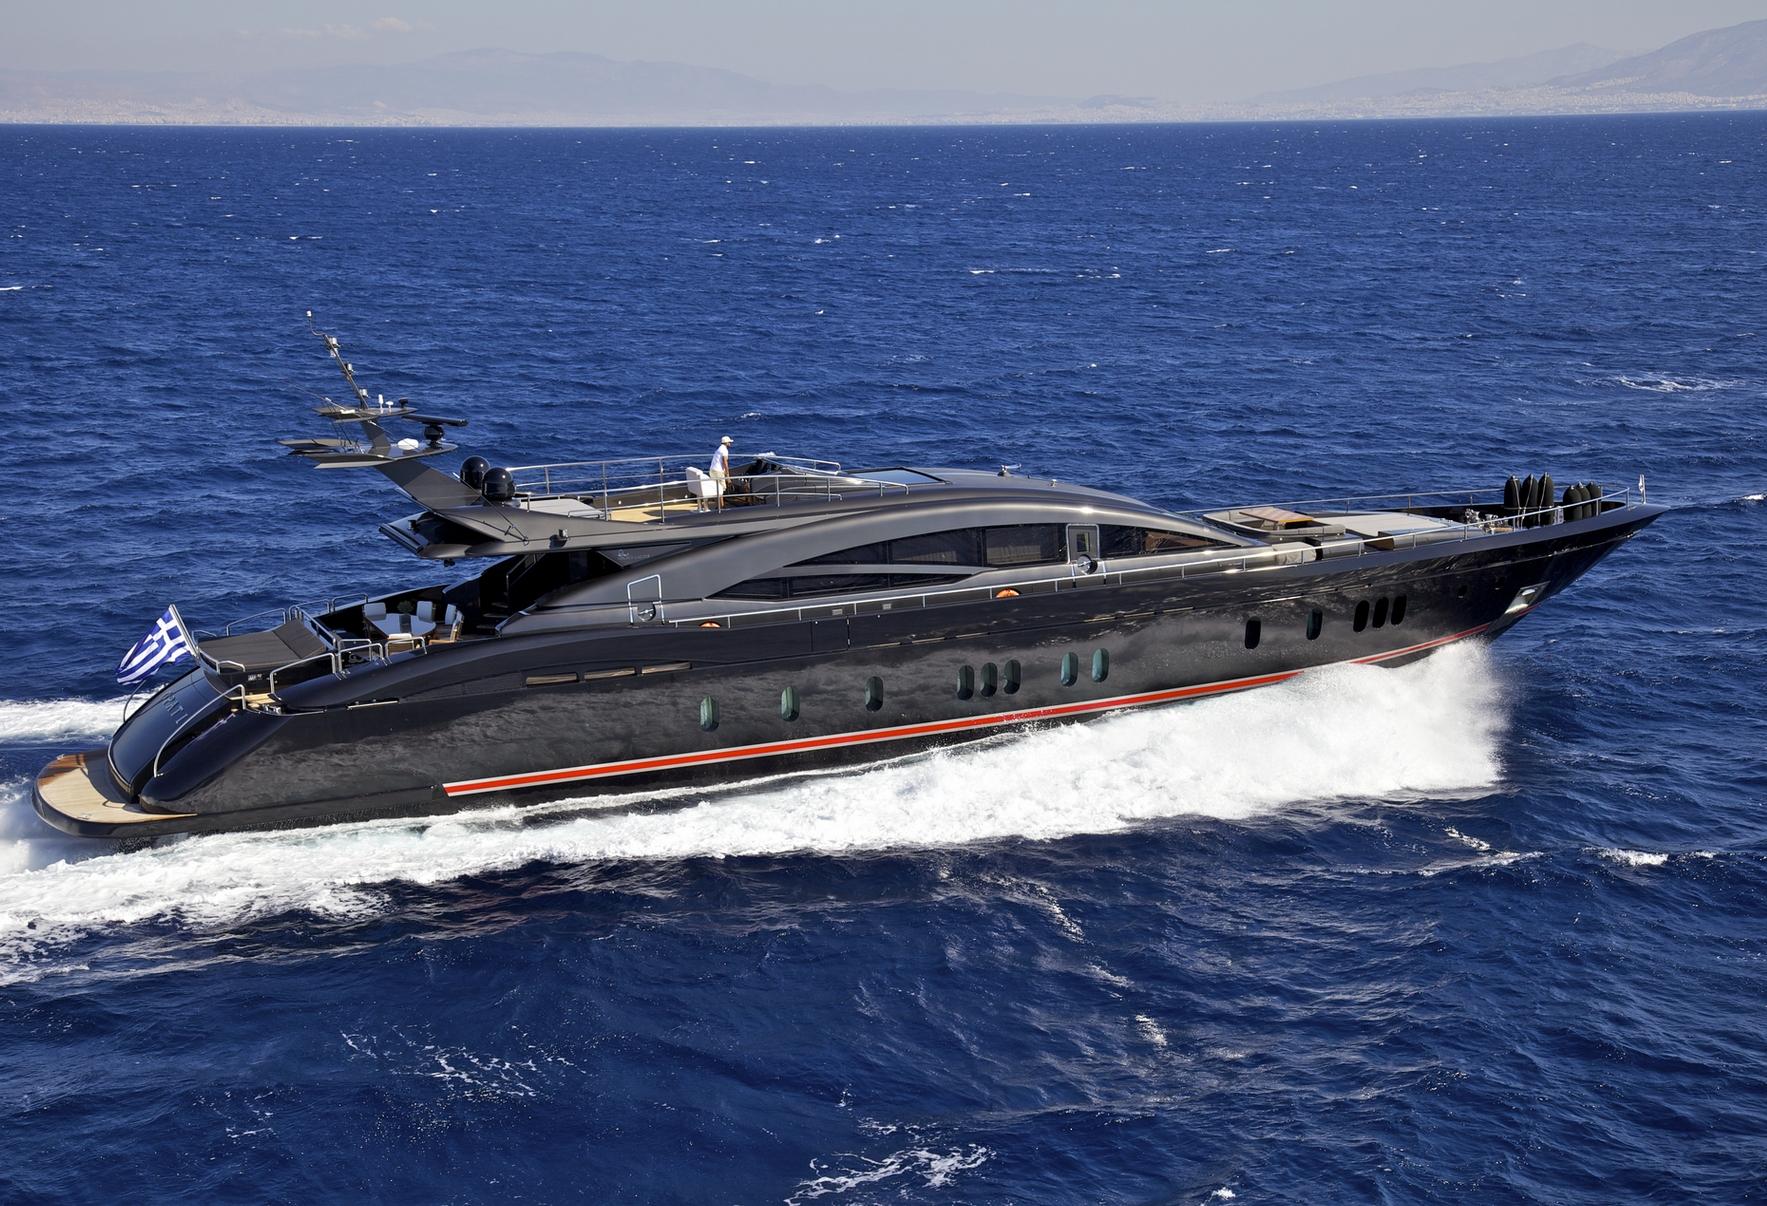 Charter super O'PATI in Greece, Turkey & Croatia  - Luxury